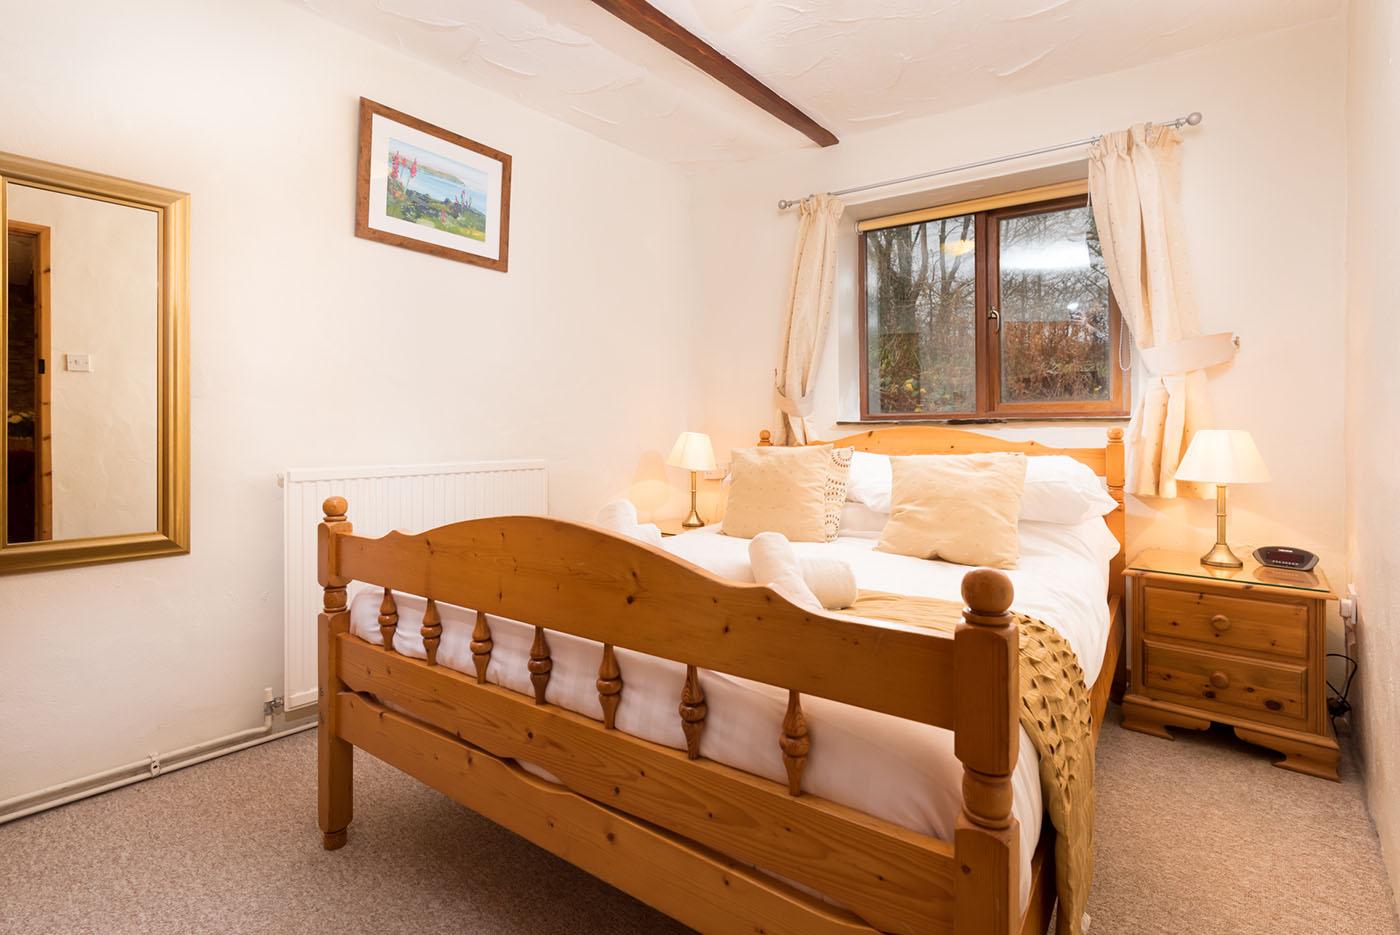 Linhay master bedroom